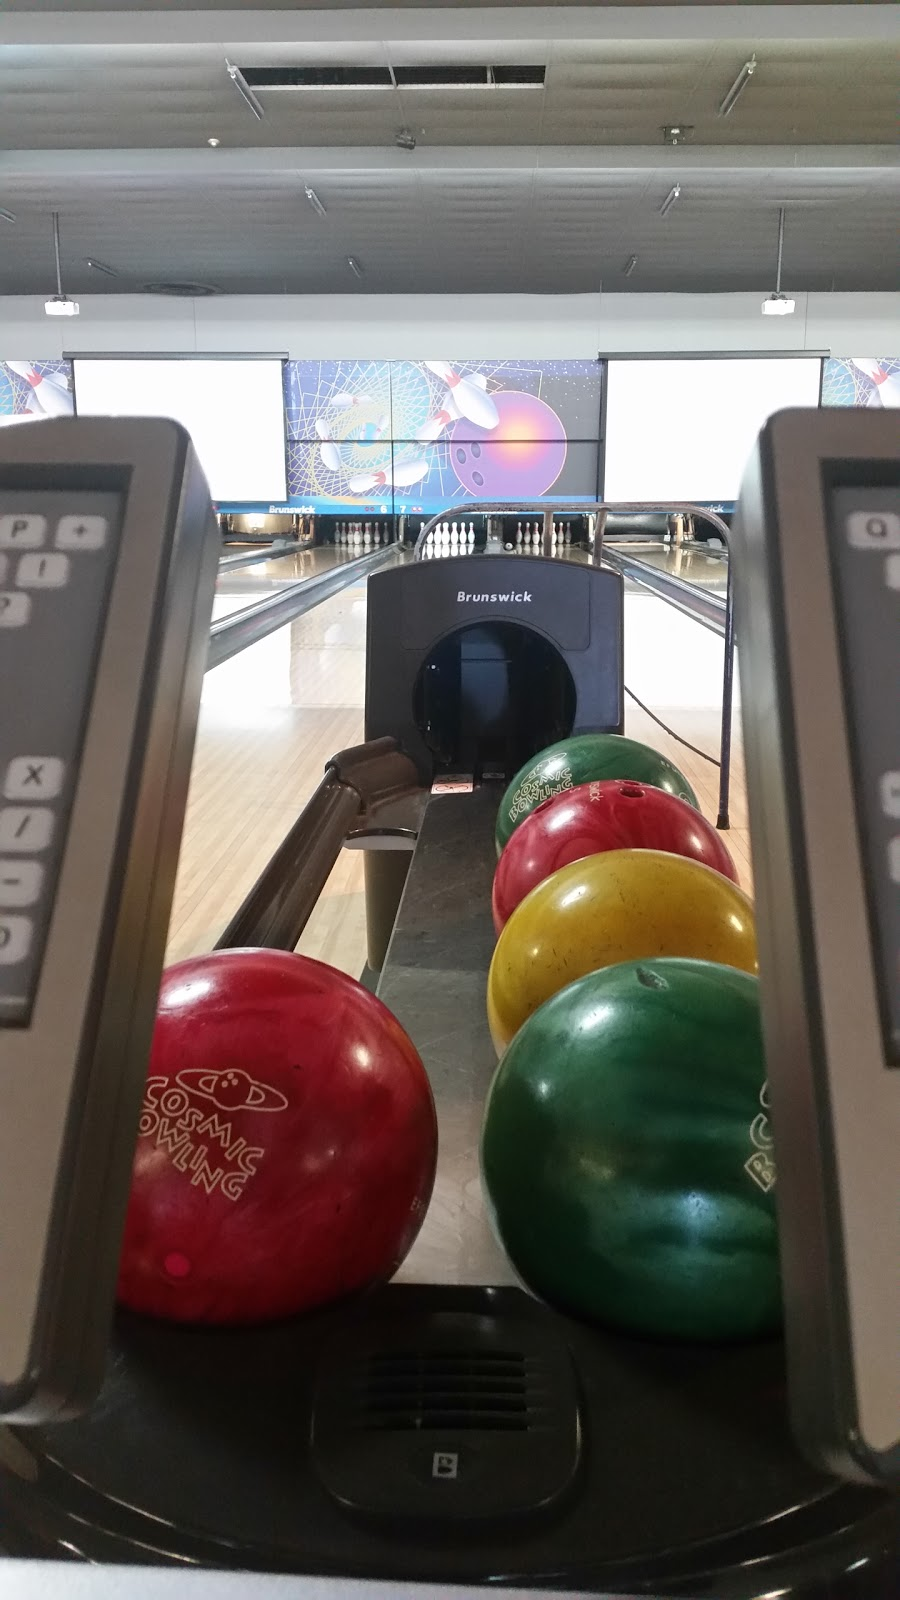 Super Bowl - bowling alley  | Photo 10 of 10 | Address: 10000 Tecumseh Rd E, Windsor, ON N8R 1A2, Canada | Phone: (519) 735-7500